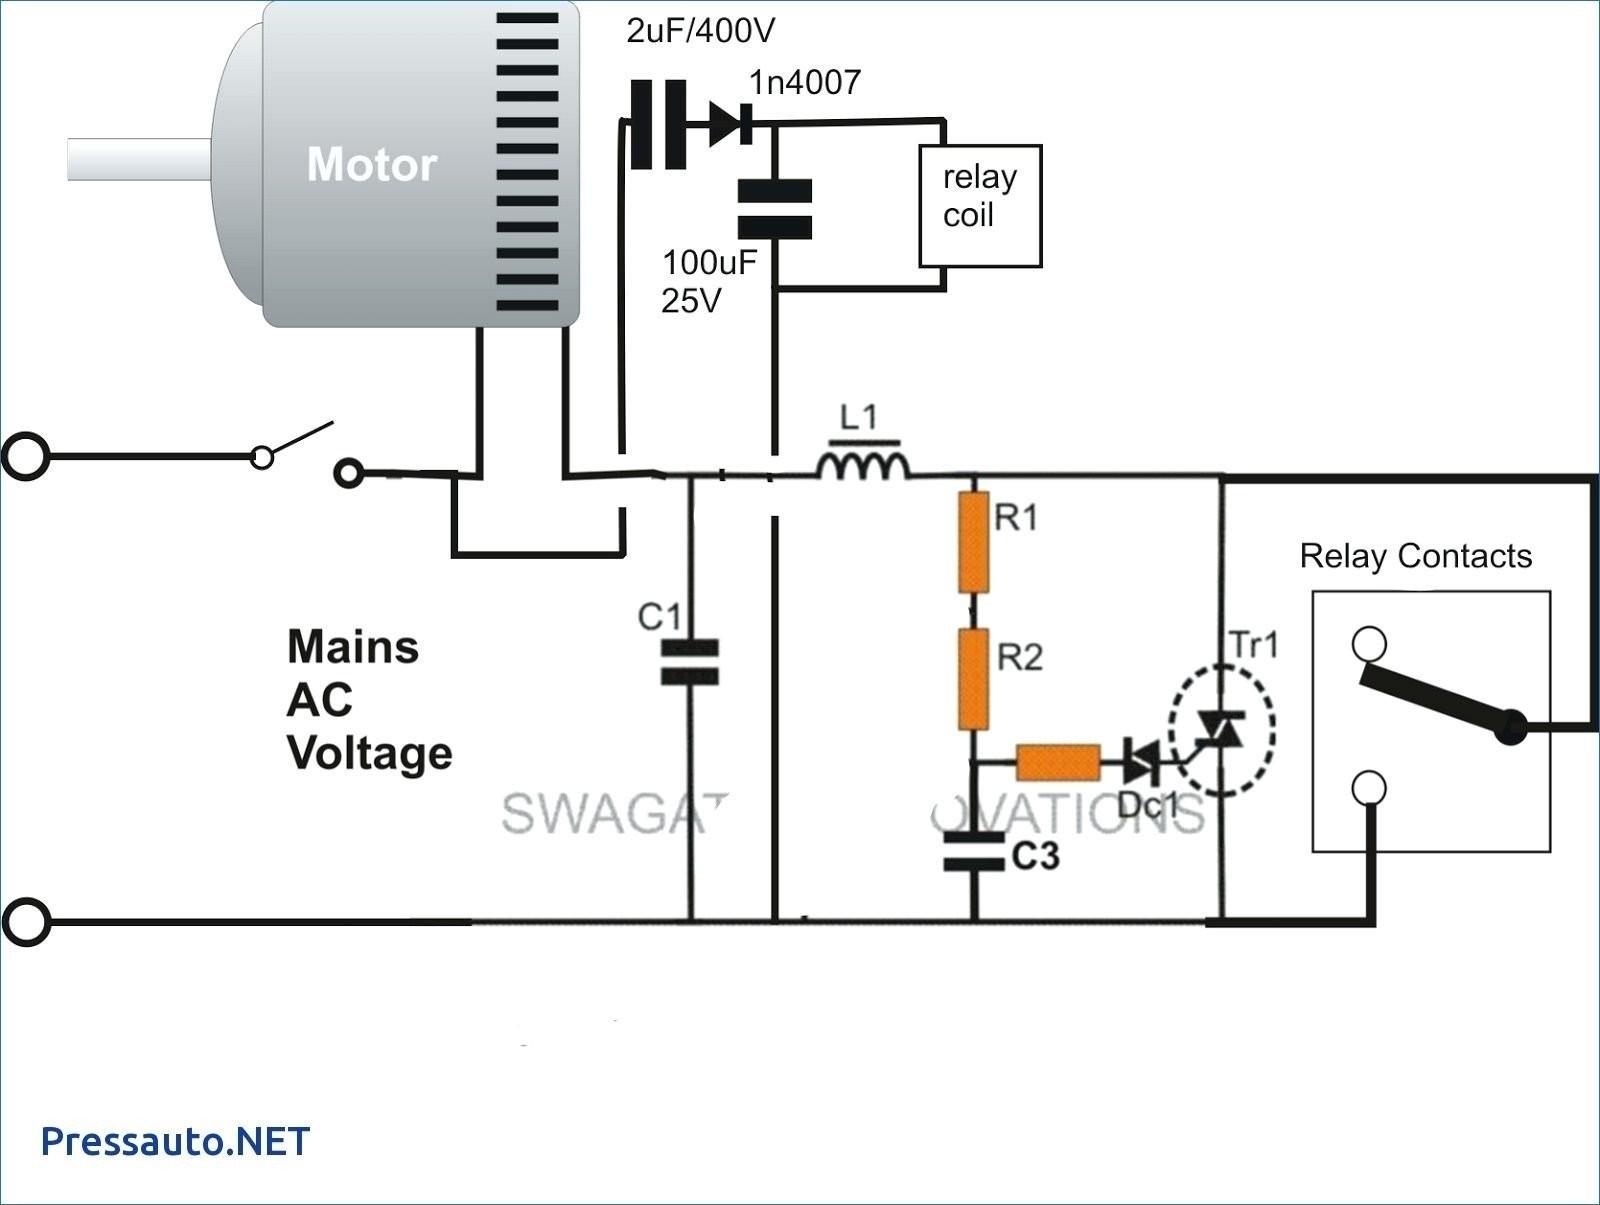 Magnetic Motor Starter Wiring Diagram For Or - Panoramabypatysesma - Motor Starter Wiring Diagram